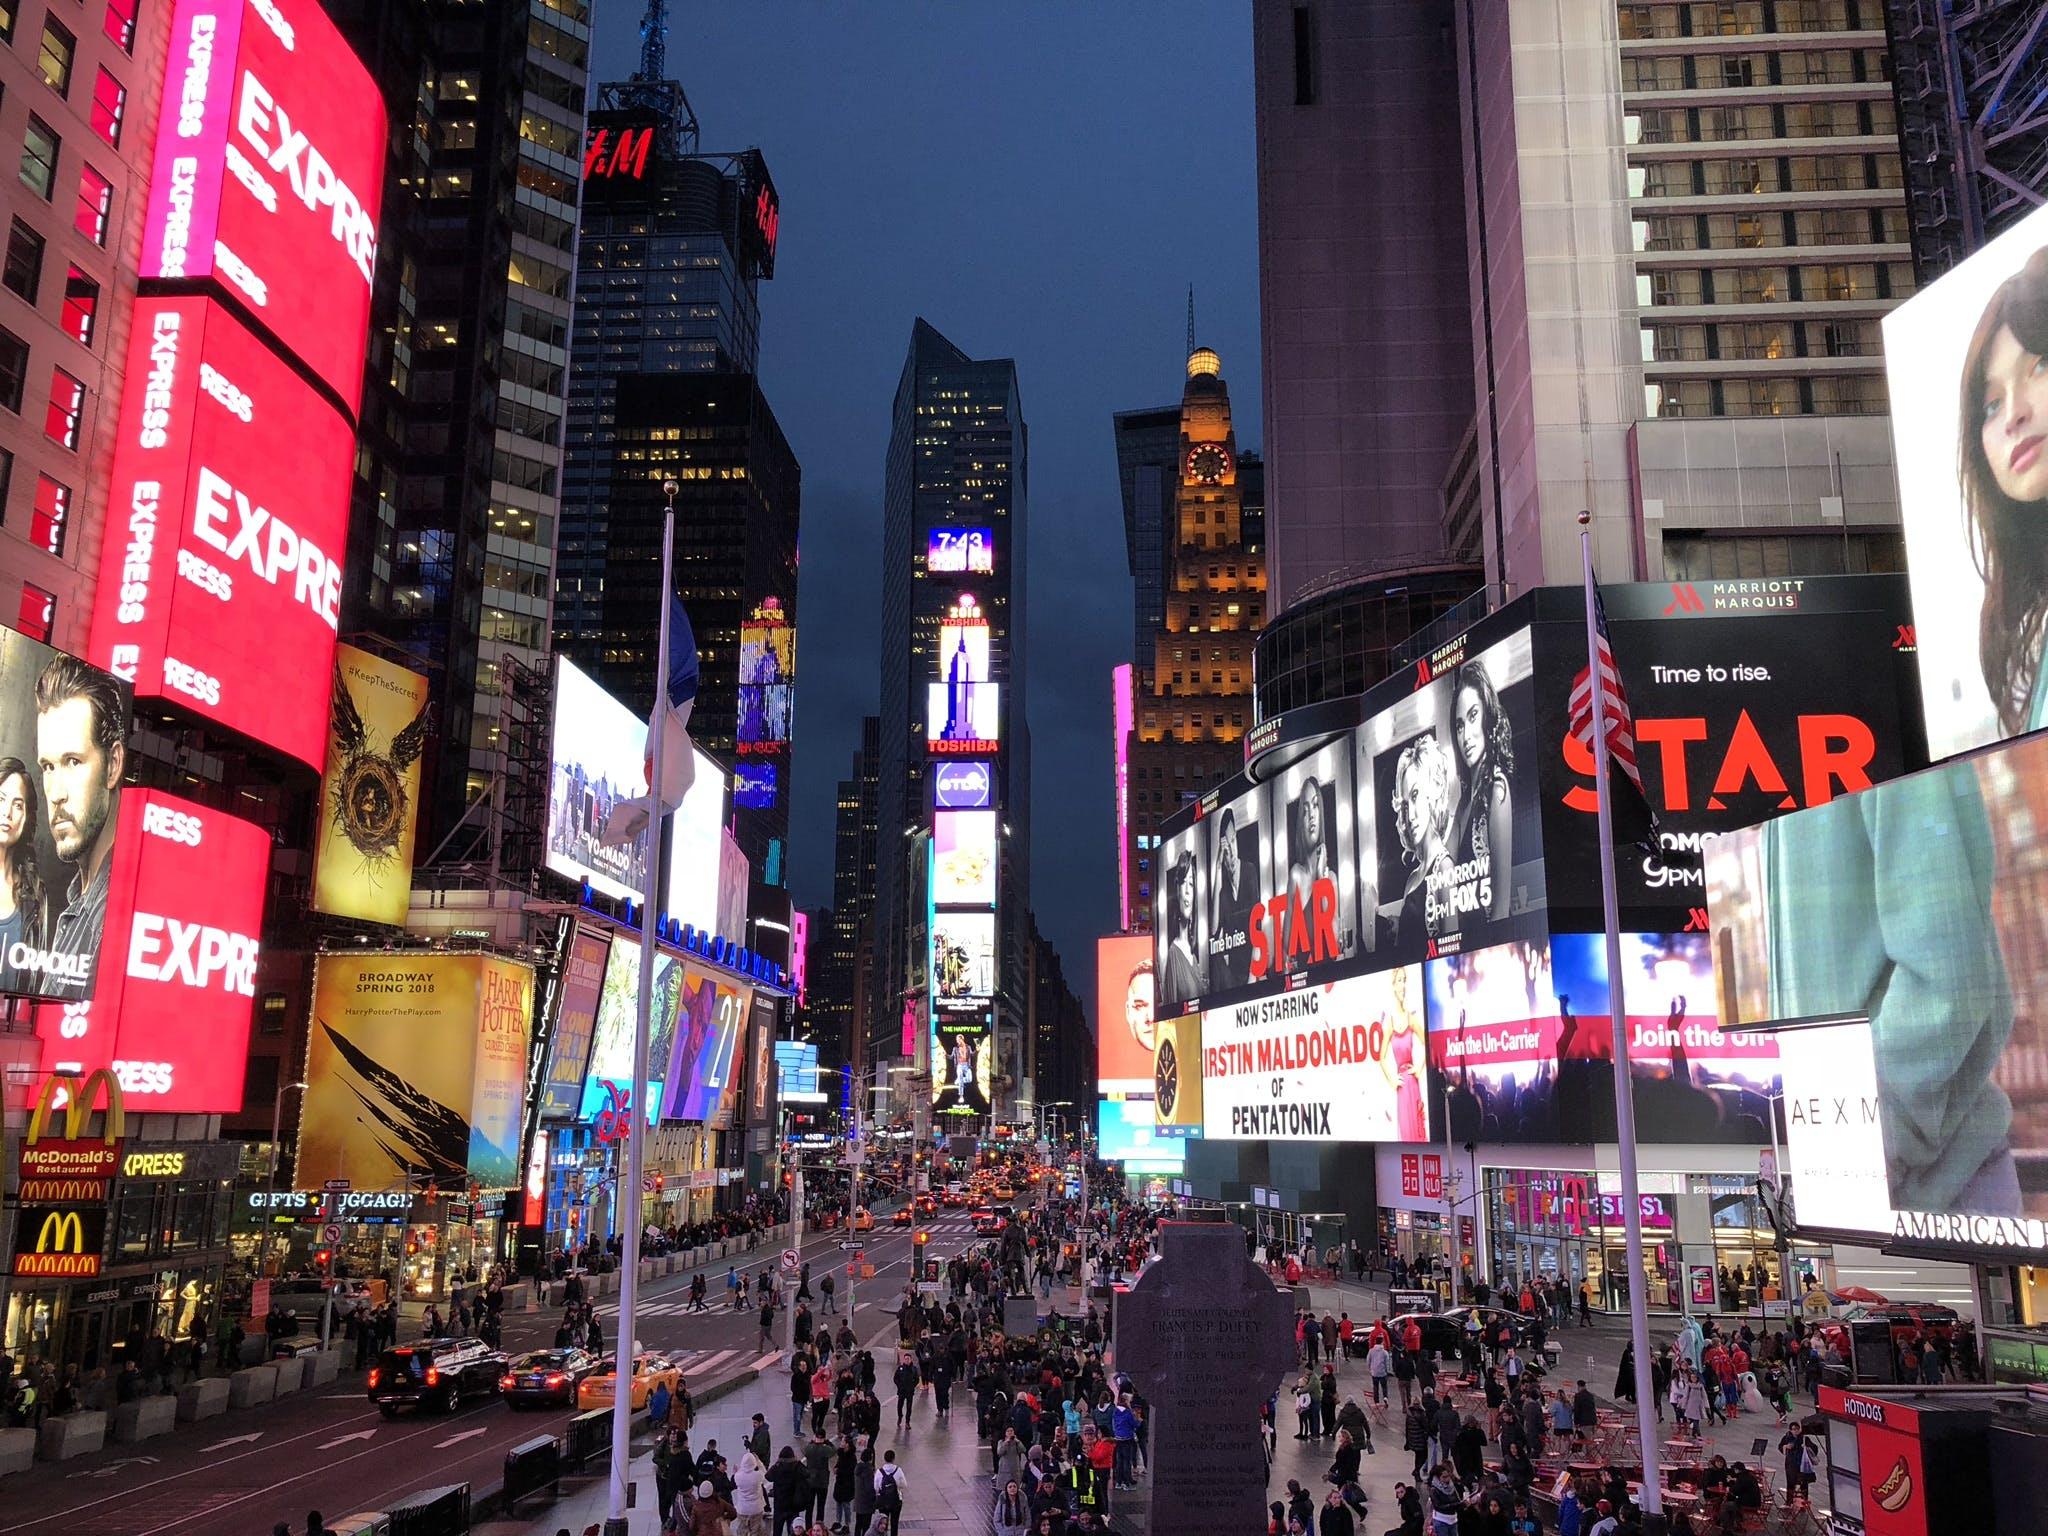 Crowd Walking Between Lighted Buildings during Nighttime